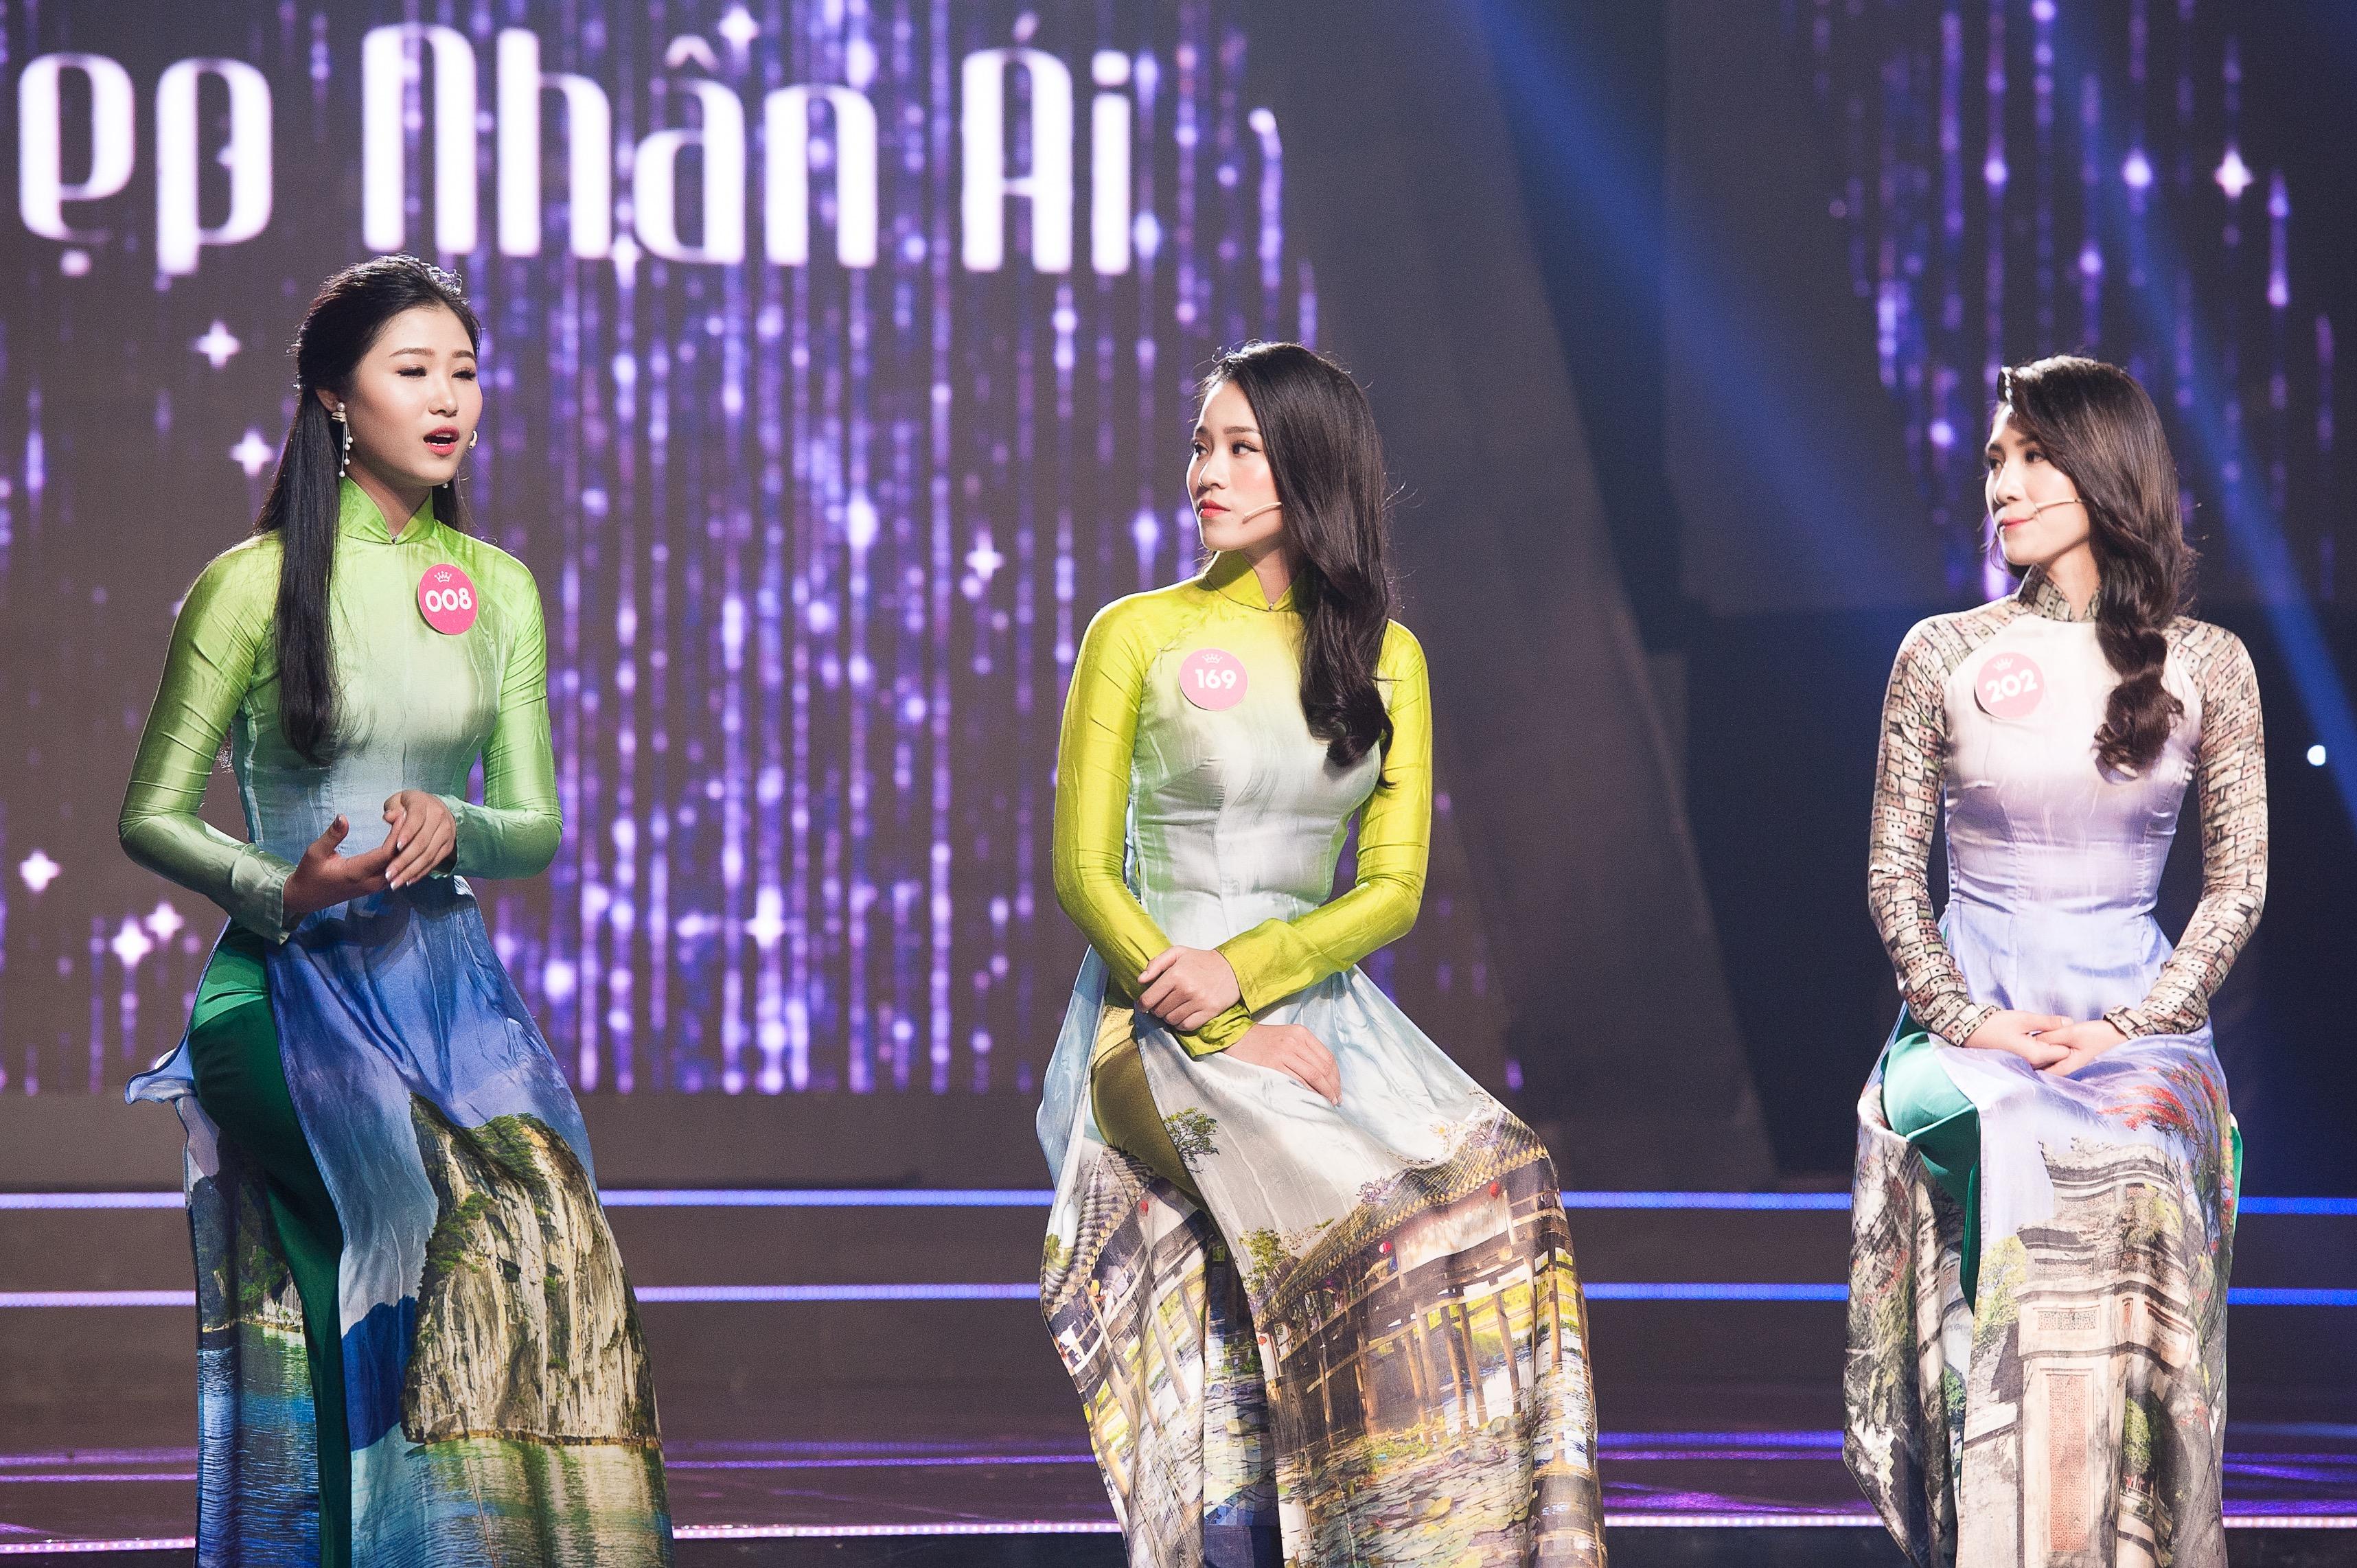 Thi sinh Hoa hau Viet Nam 2018 tung co thoi gian di lam phu ho hinh